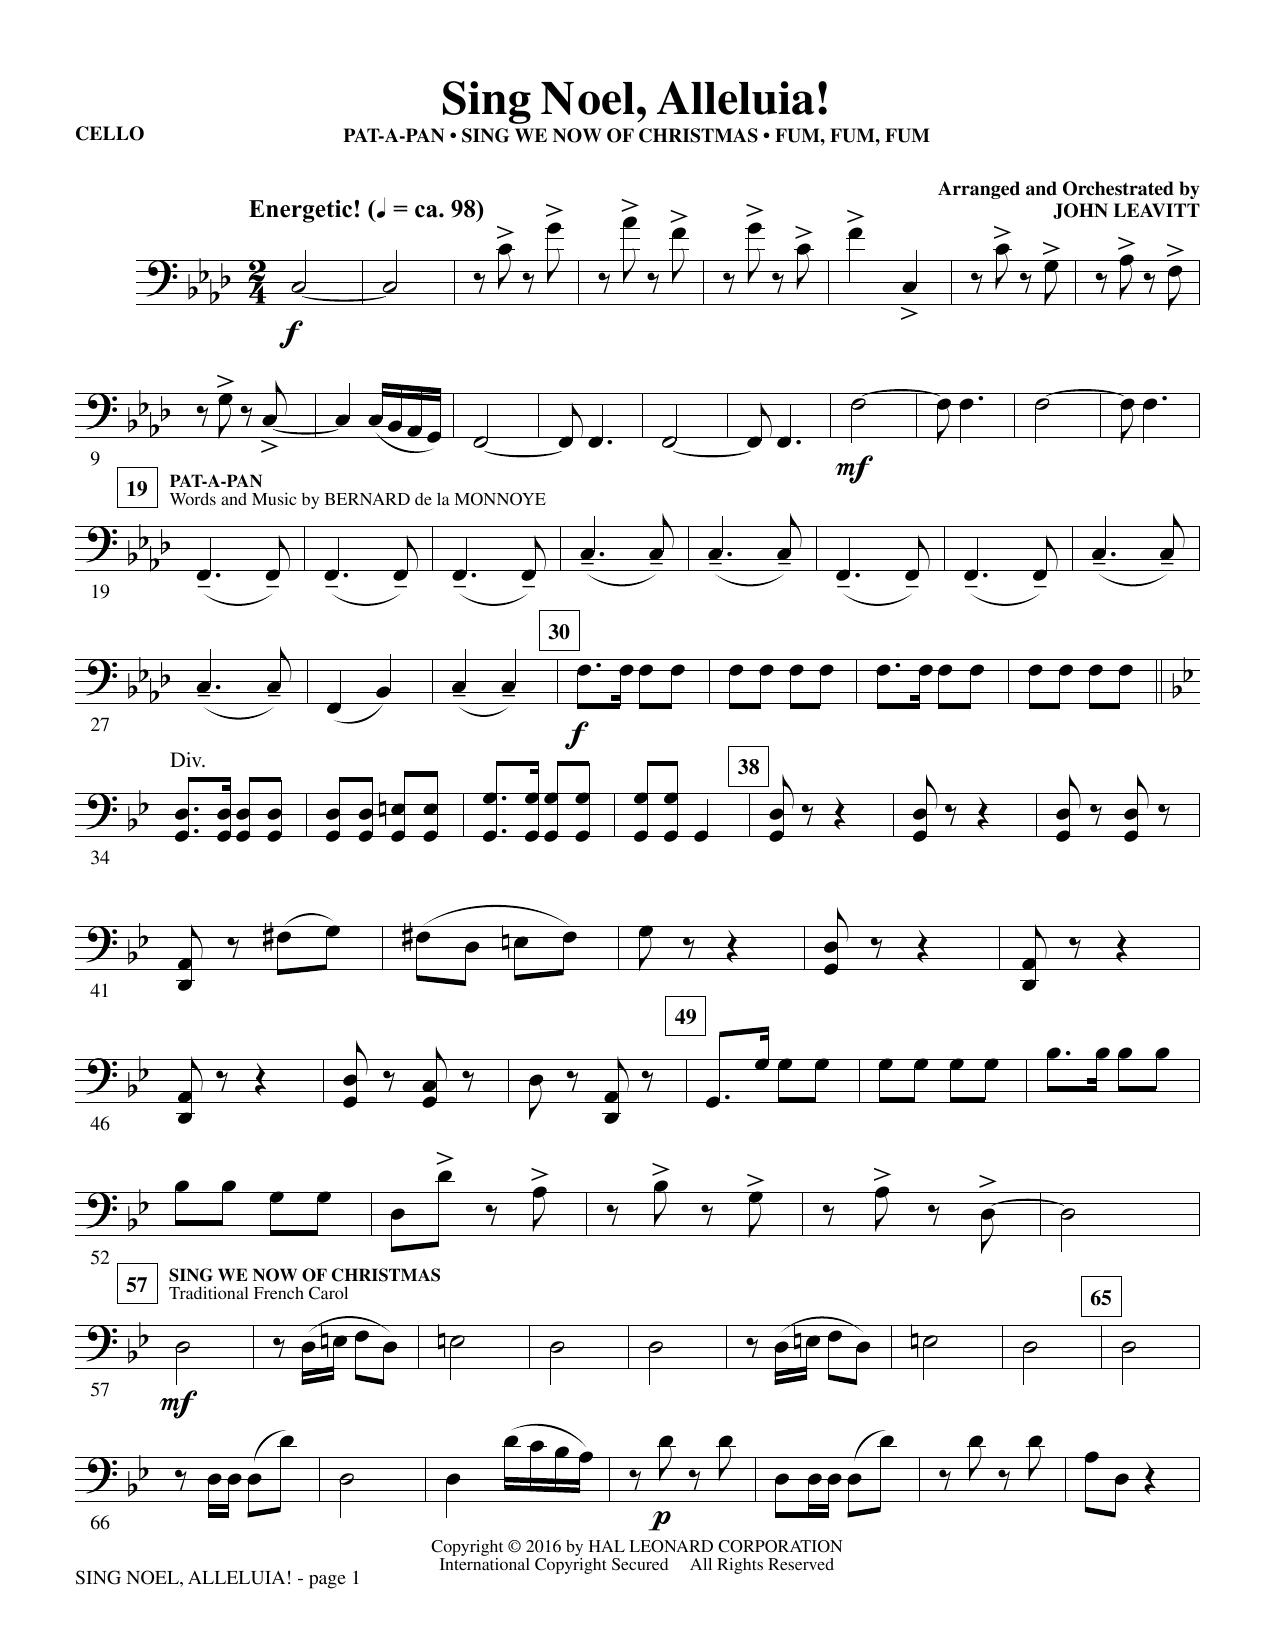 Sing Noel, Alleluia!